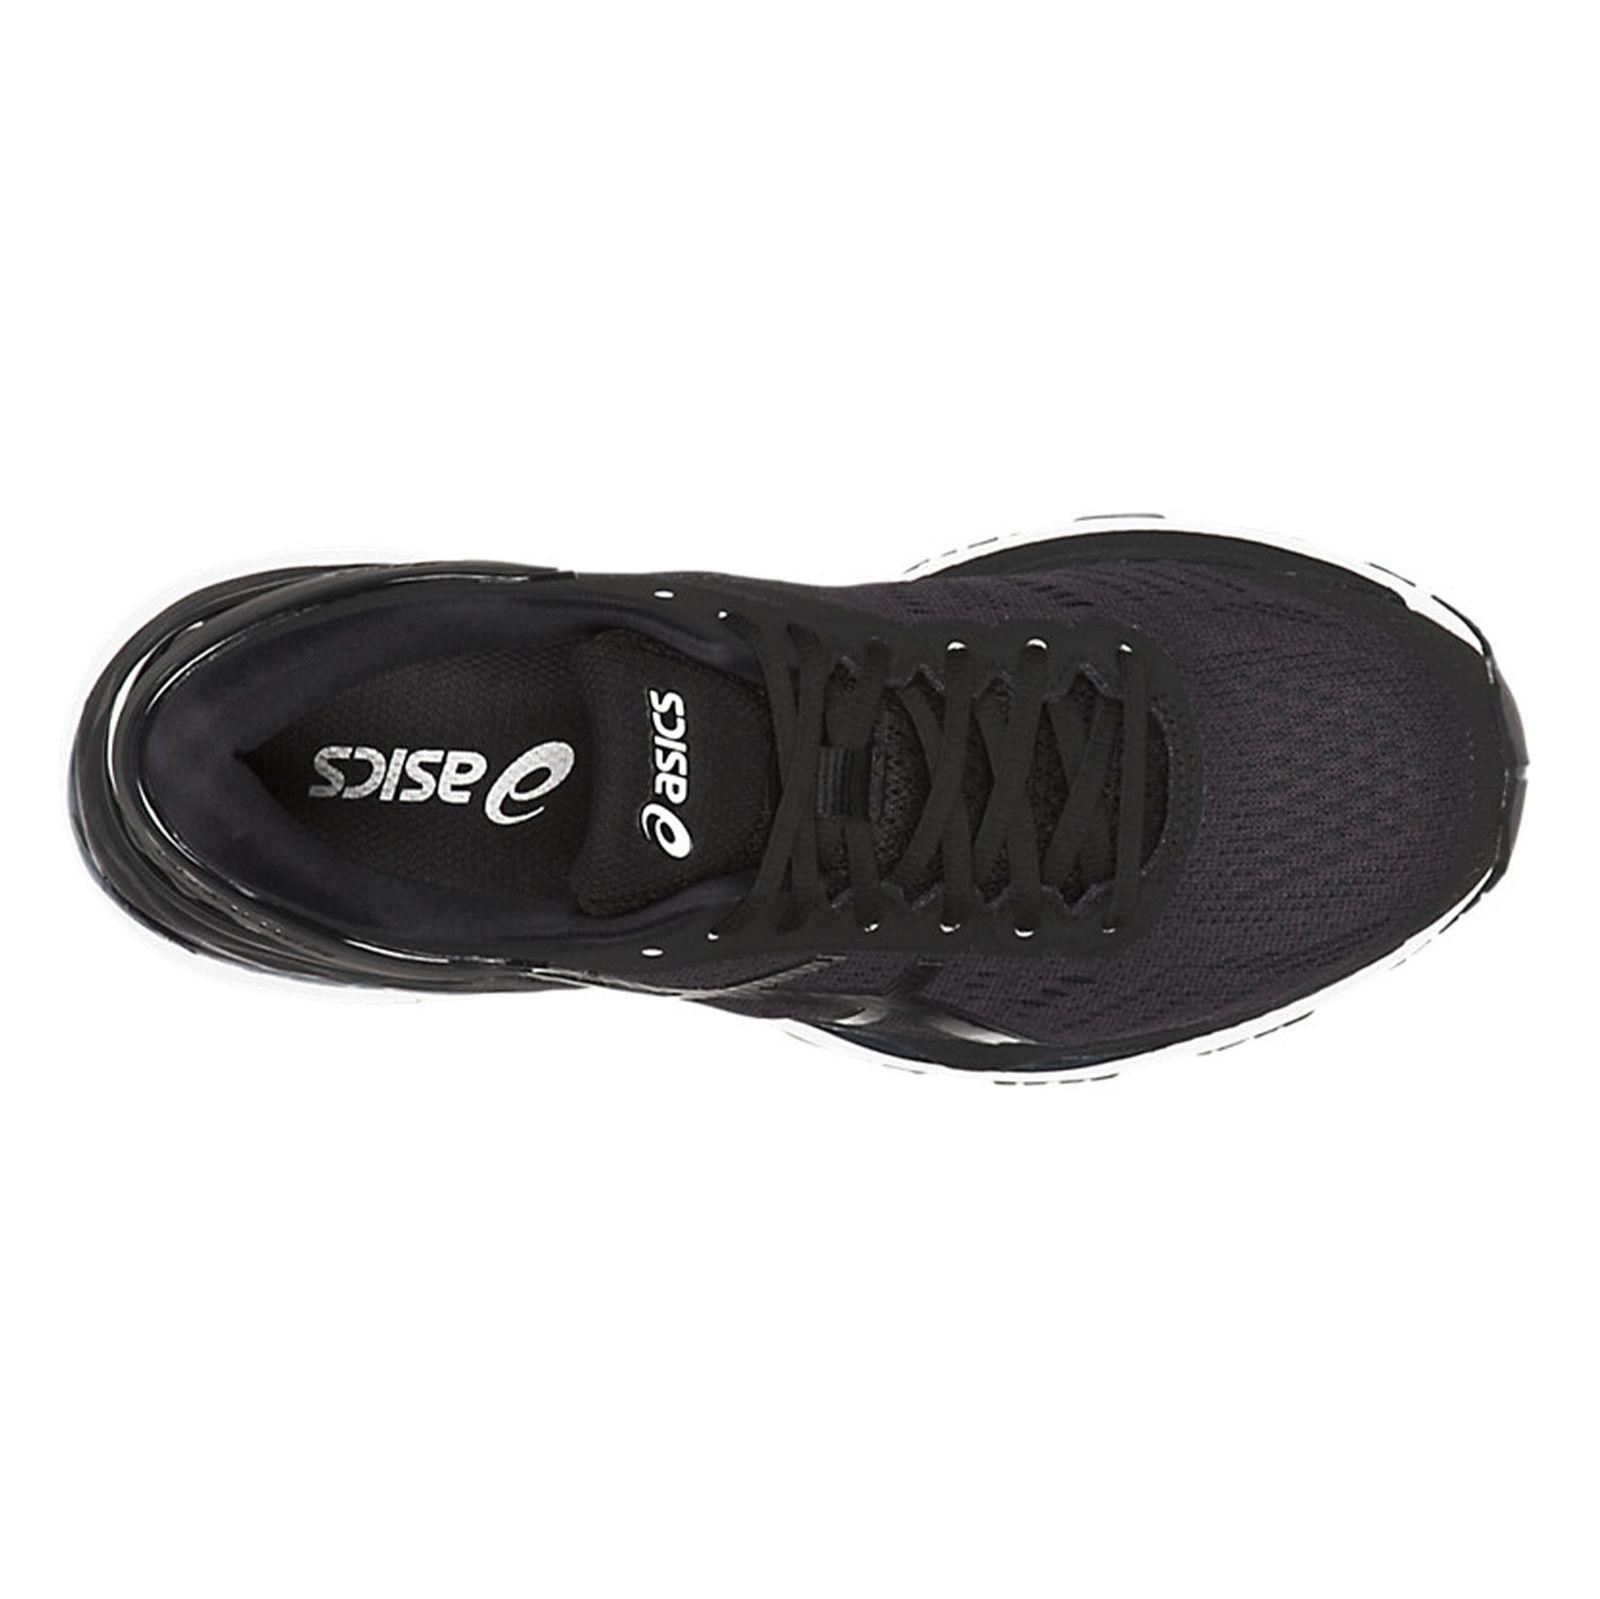 کفش دویدن بندی زنانه GEL-KAYANO 24 - اسیکس - مشکي - 2